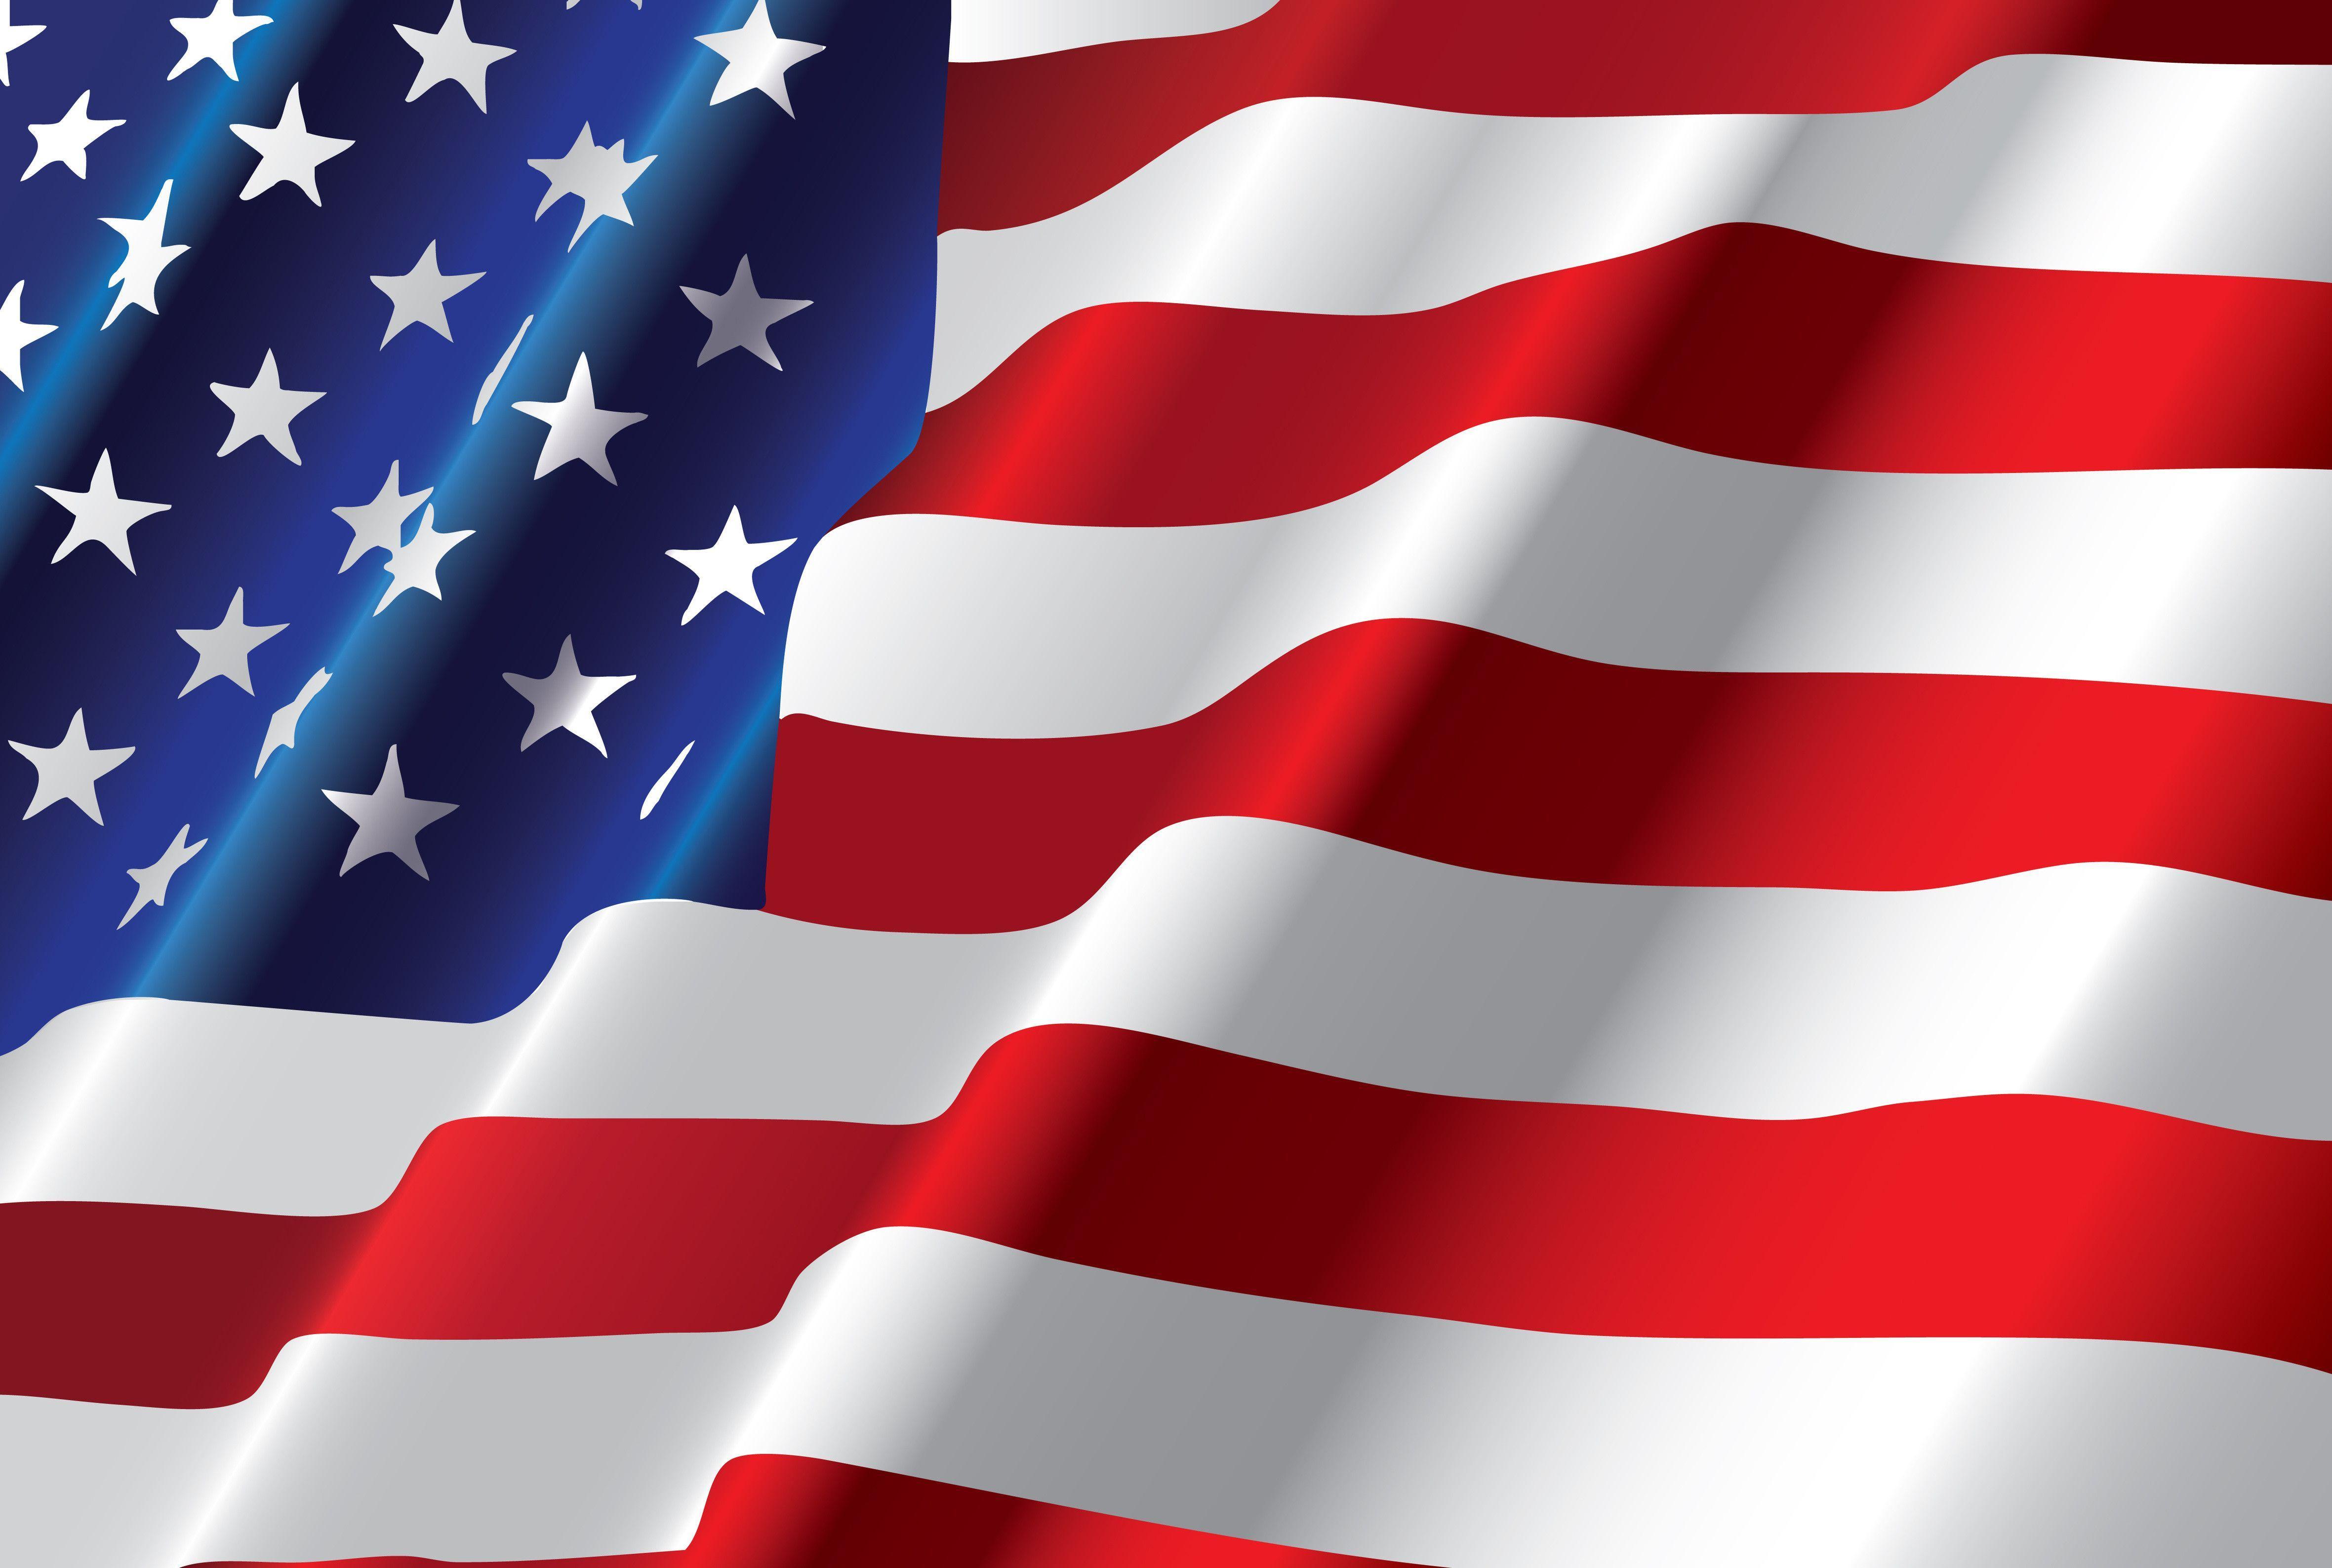 american flag - photo #11